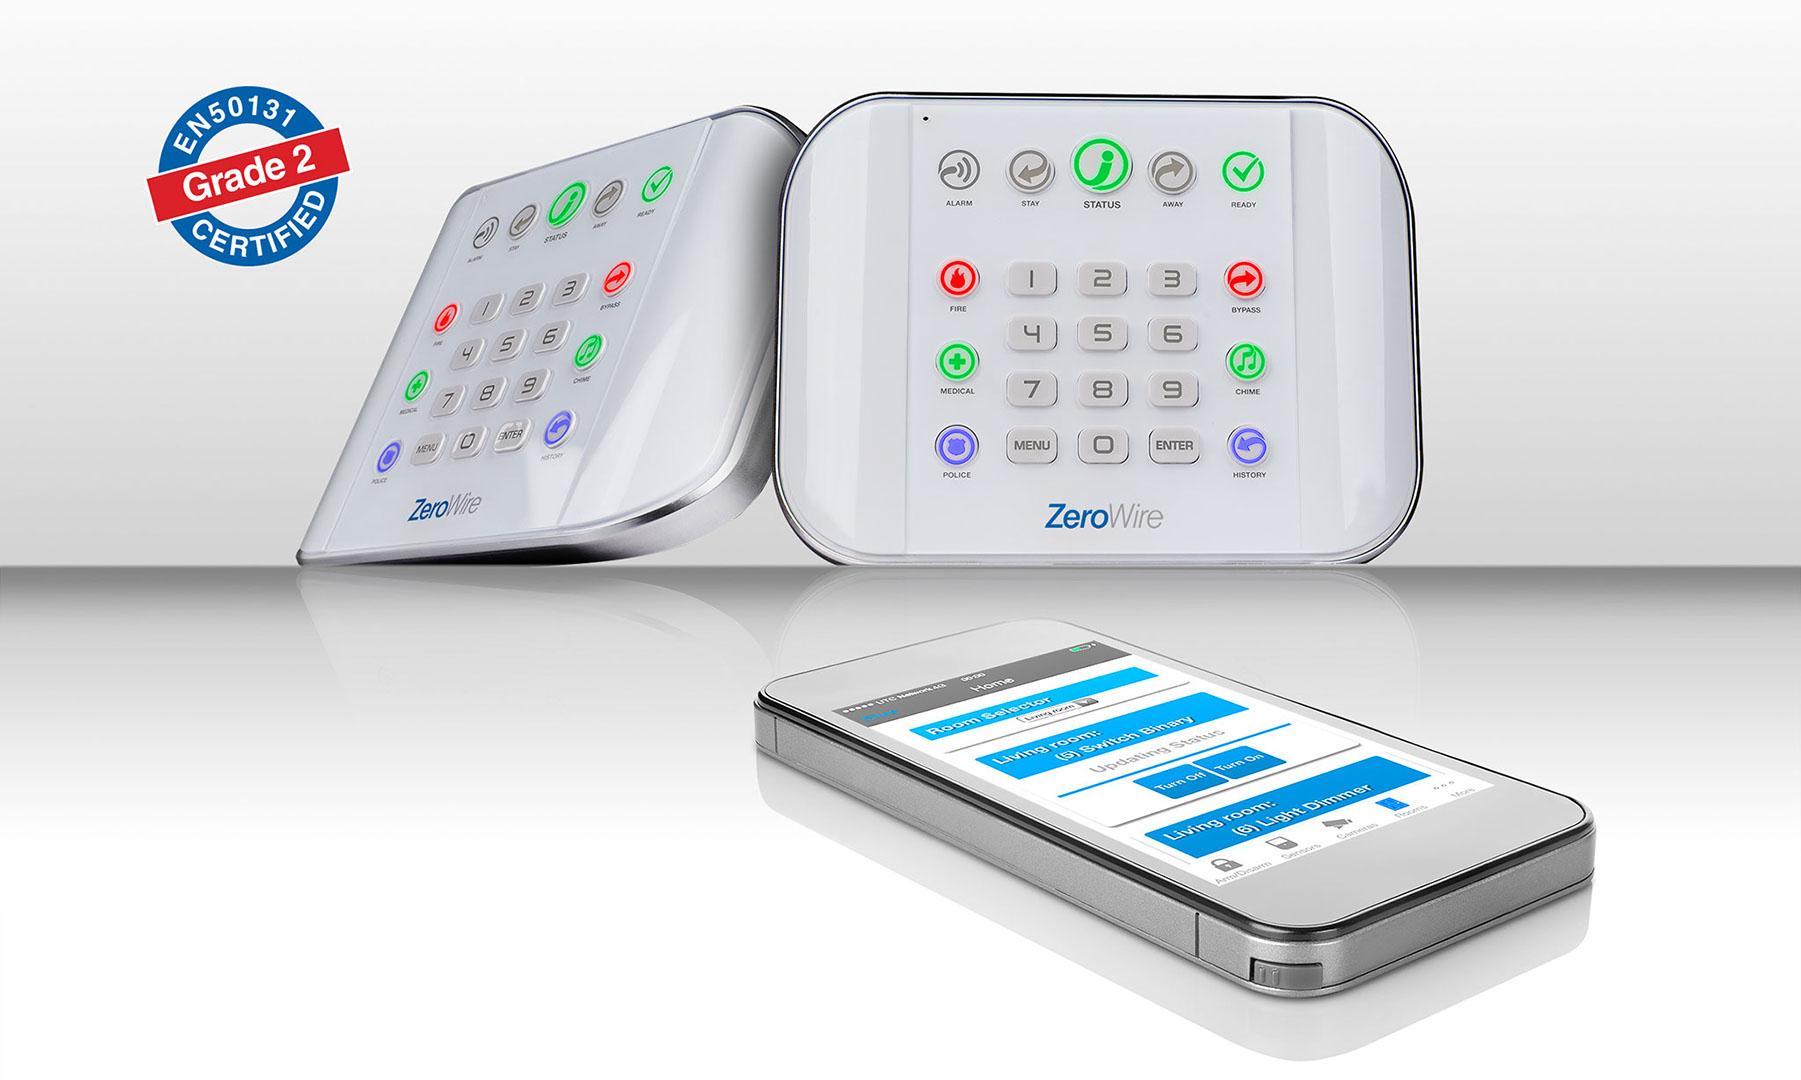 ZeroWire Smart Home Funk Alalrmanlage